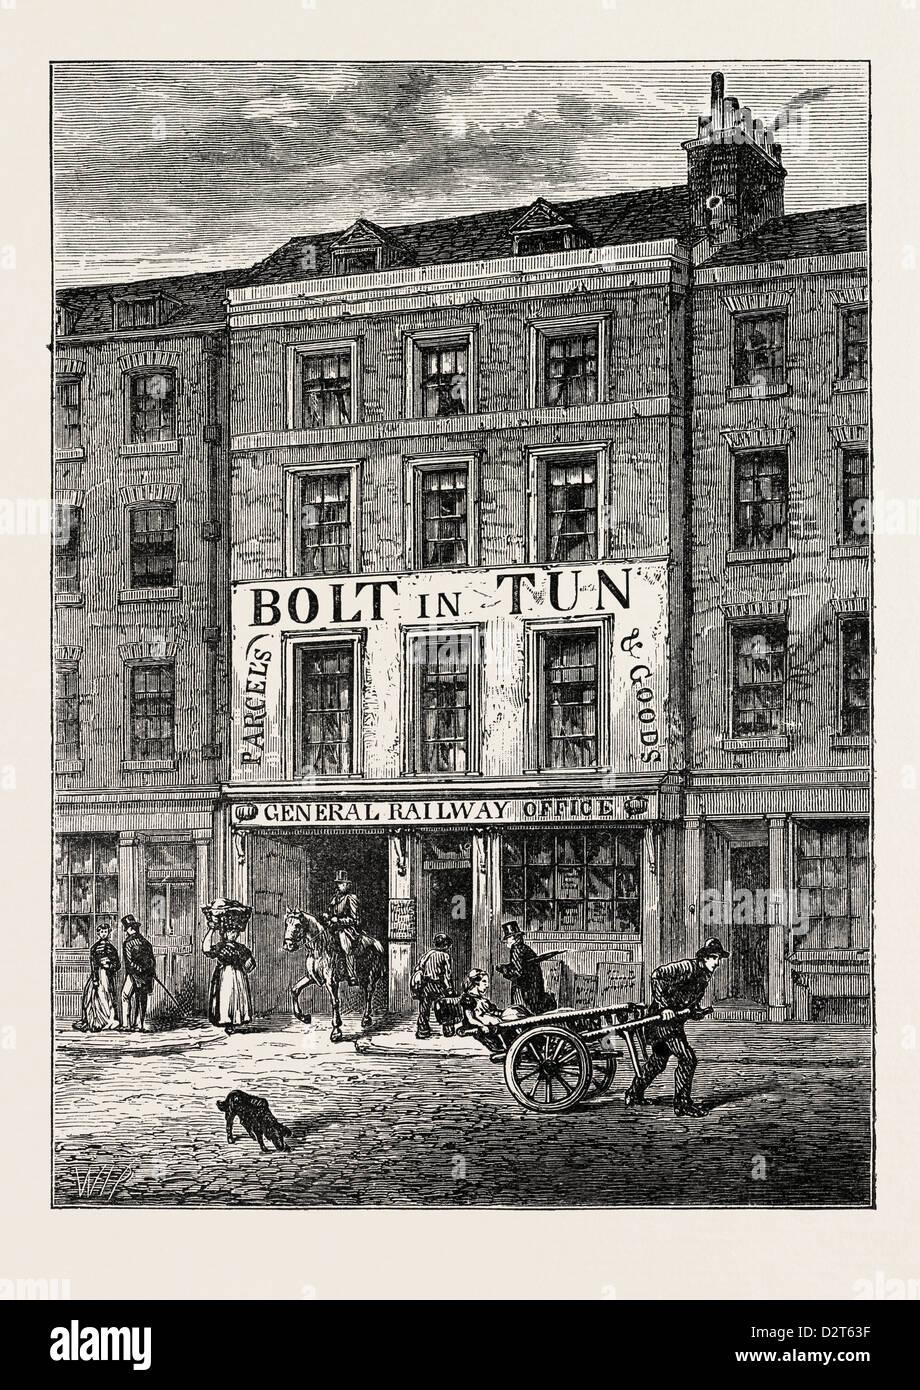 THE BOLT-IN-TUN 1859 LONDON - Stock Image